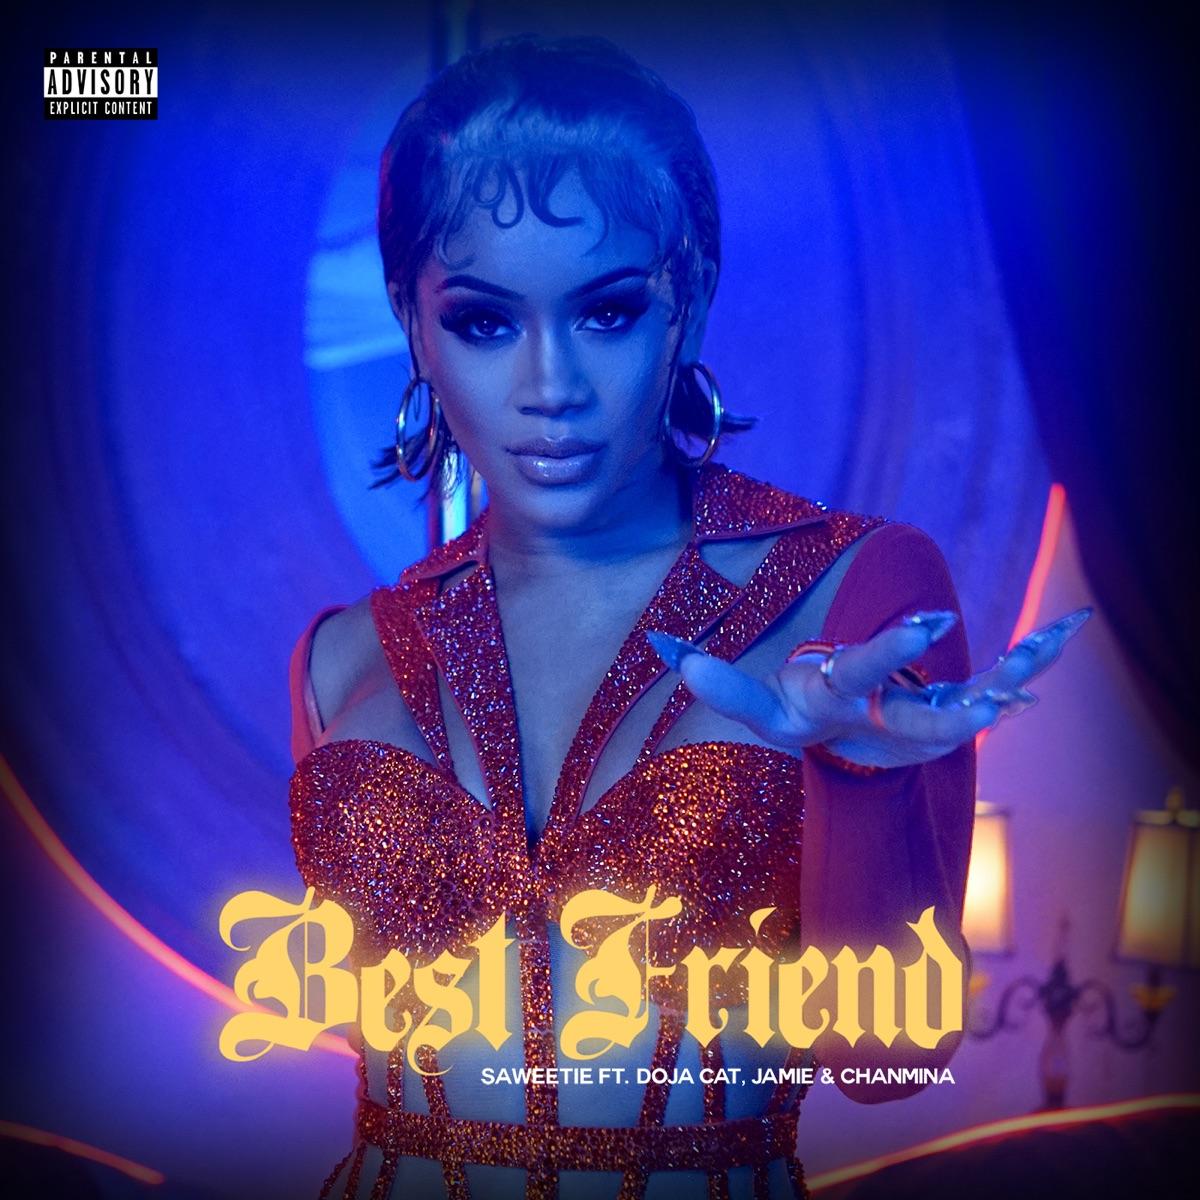 『Saweetie - Best Friend (feat. Doja Cat, Jamie & CHANMINA) [Remix]』収録の『Best Friend (feat. Doja Cat, Jamie & CHANMINA) [Remix]』ジャケット